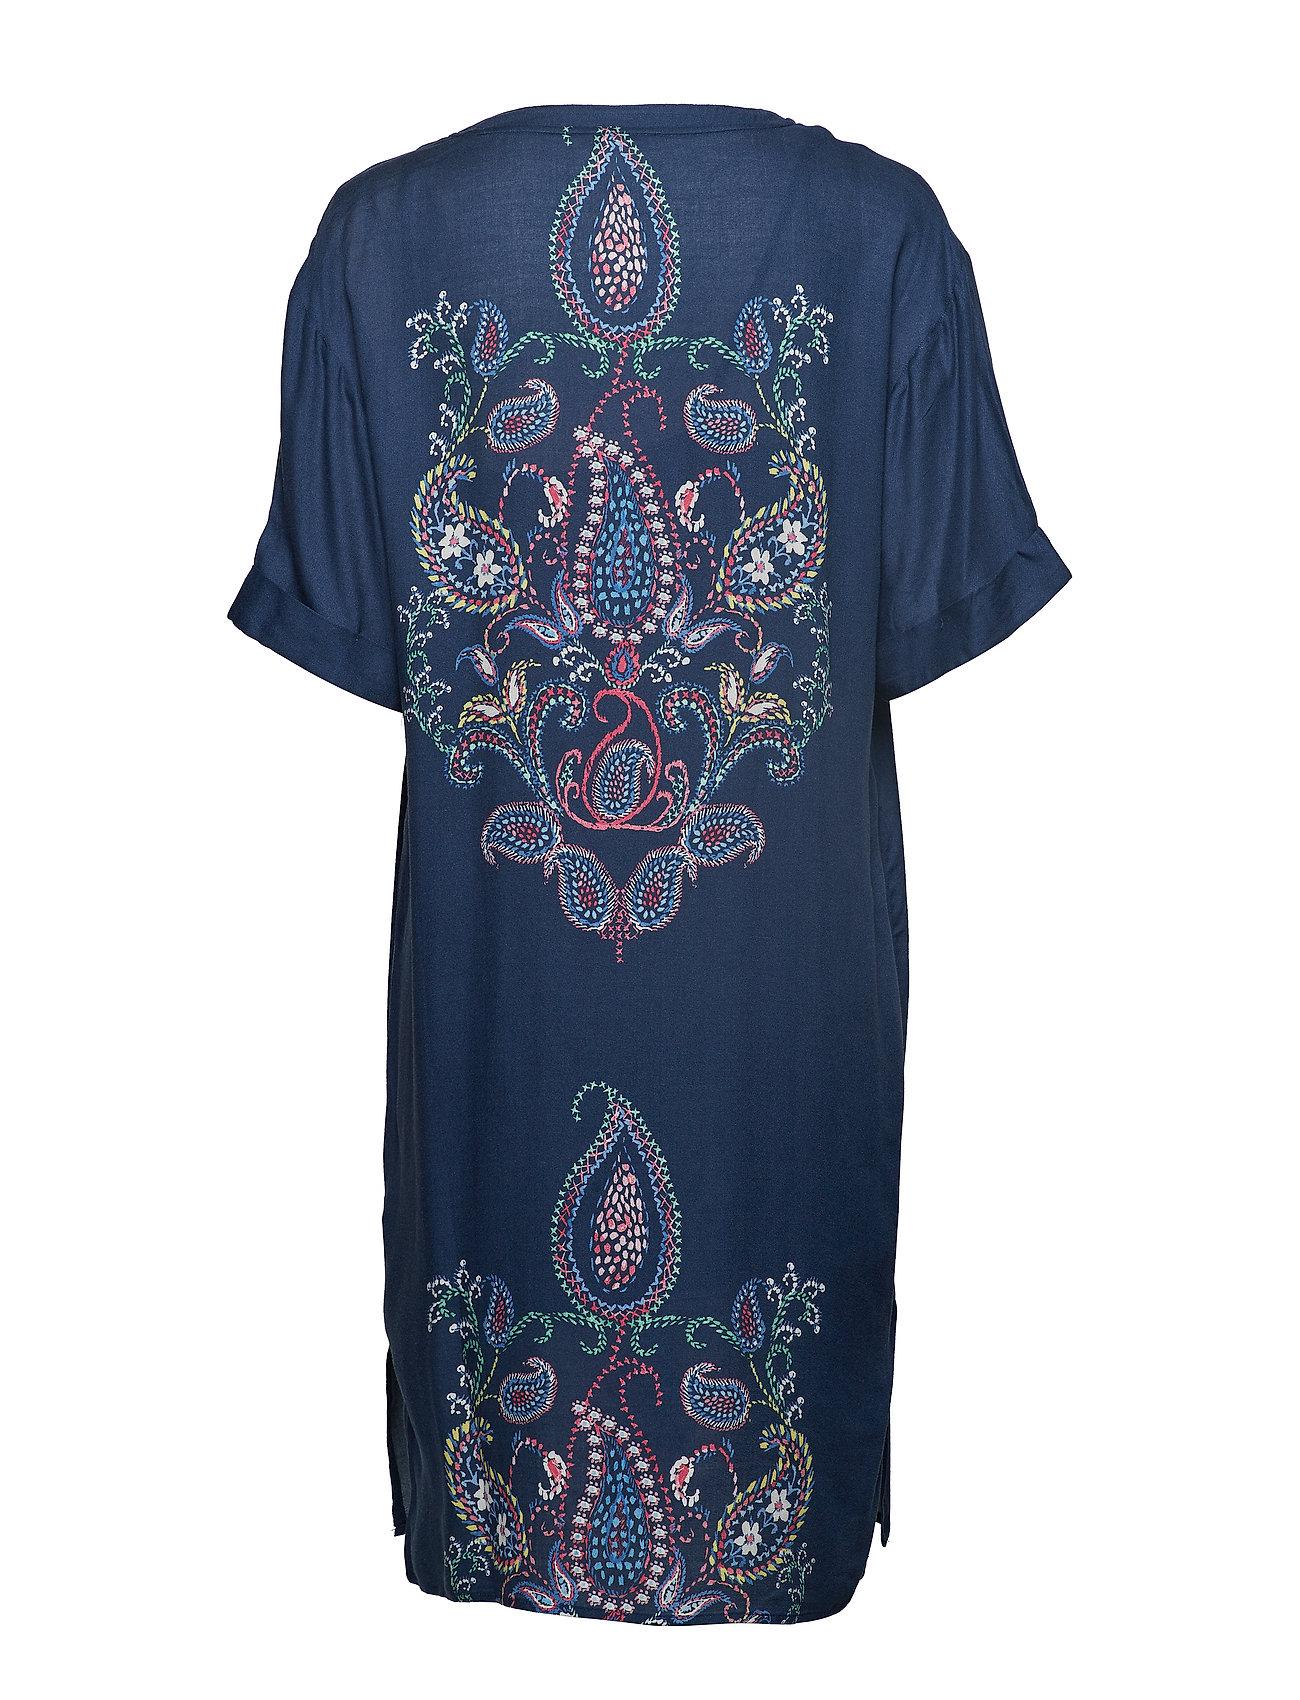 Dresses Light Woven (Navy) (419.99 kr) - Esprit Casual